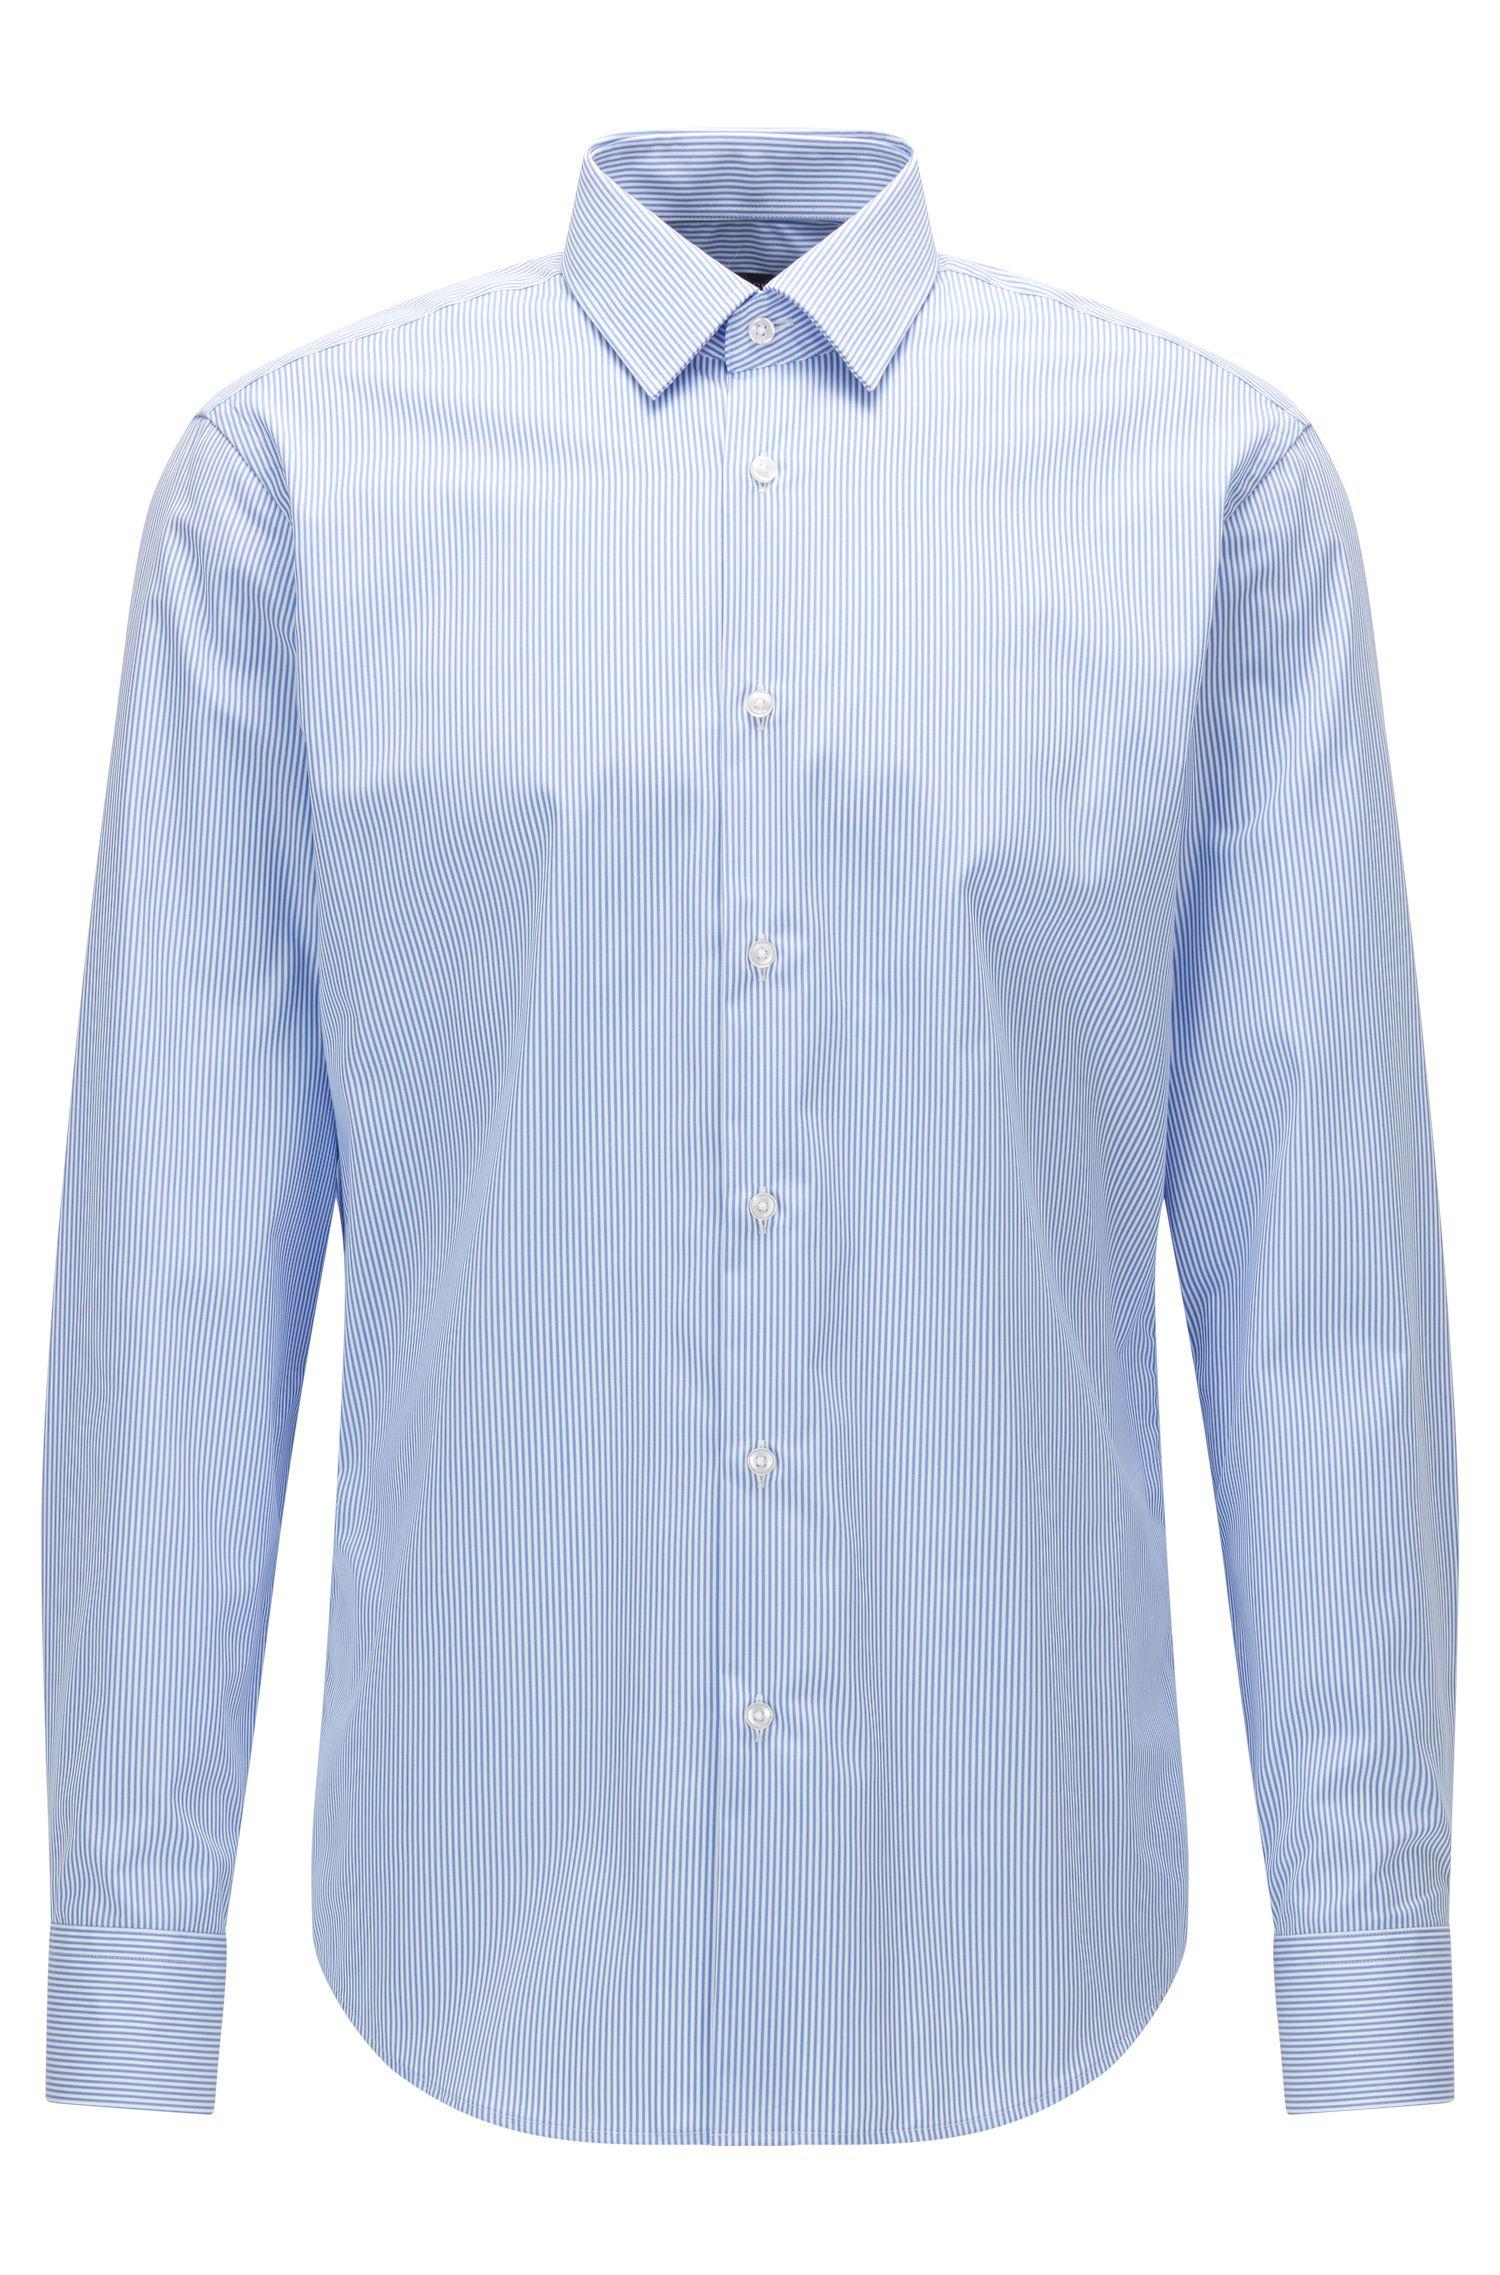 Regular-fit striped shirt in cotton poplin